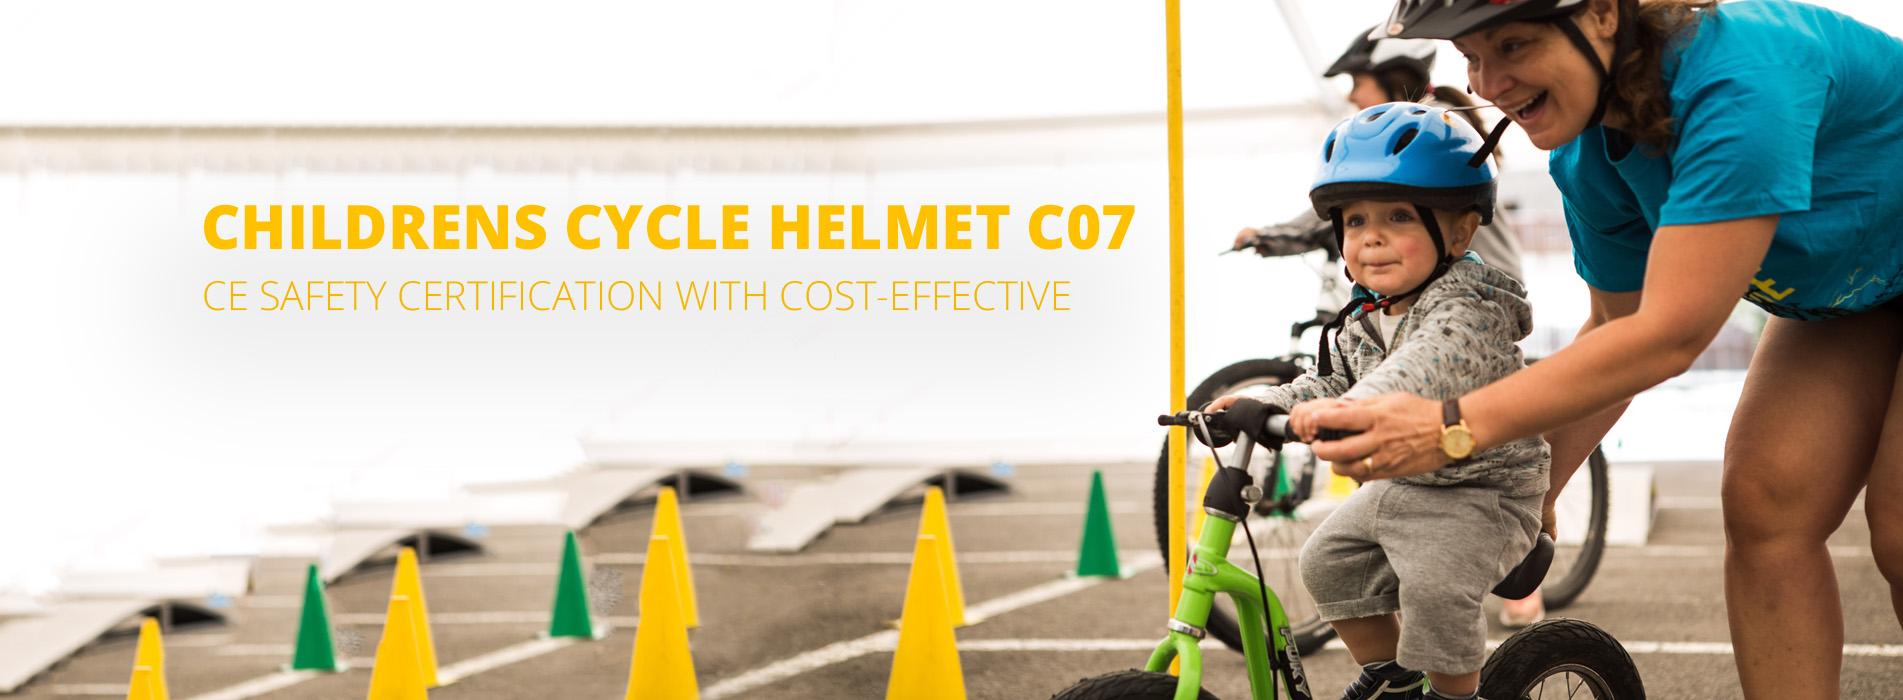 childrens cycle helmet c07 banner